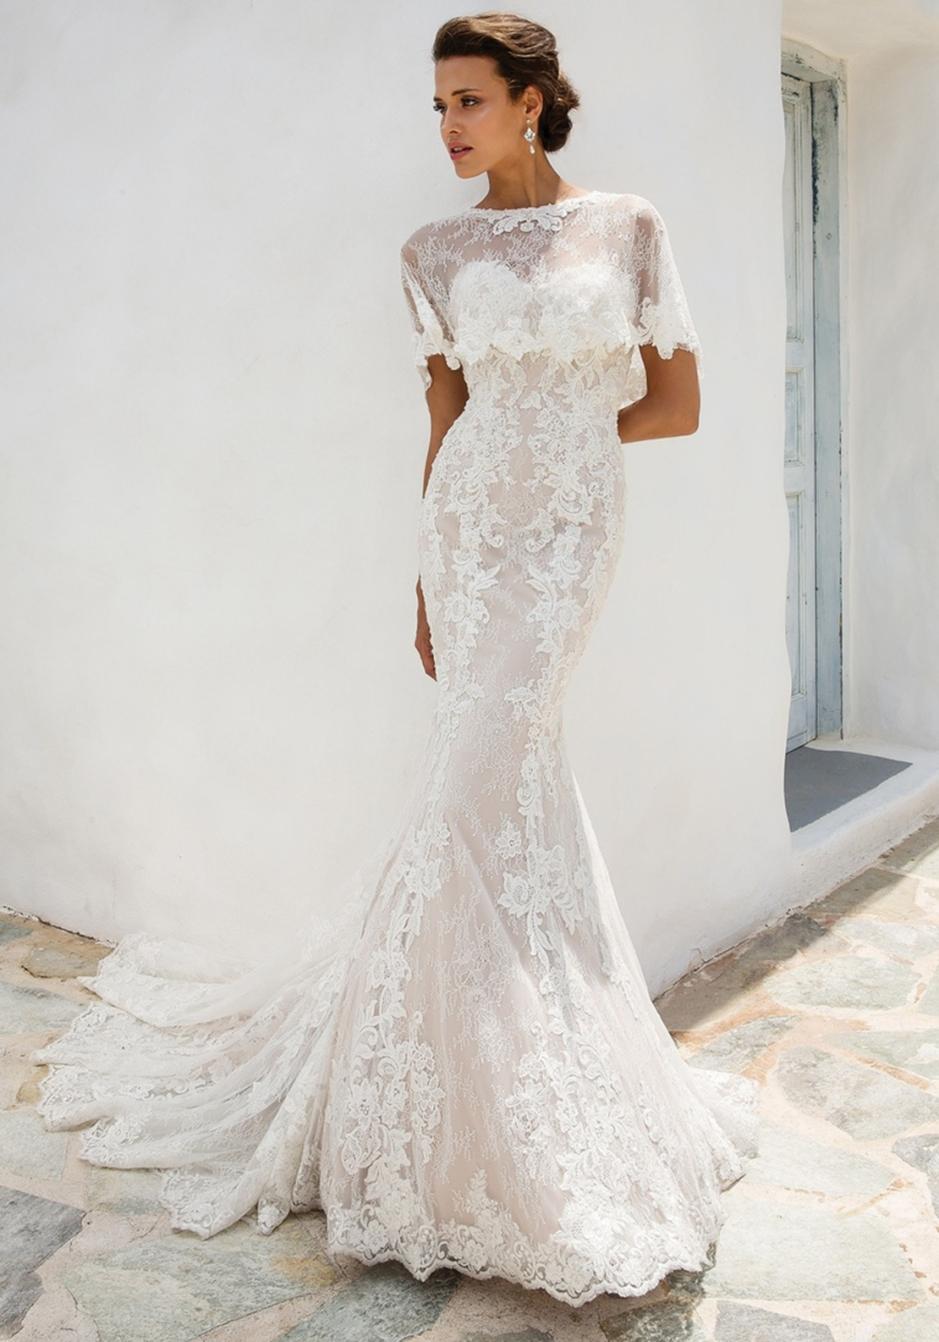 Justin-Alexander-8920-Wedding-Dress